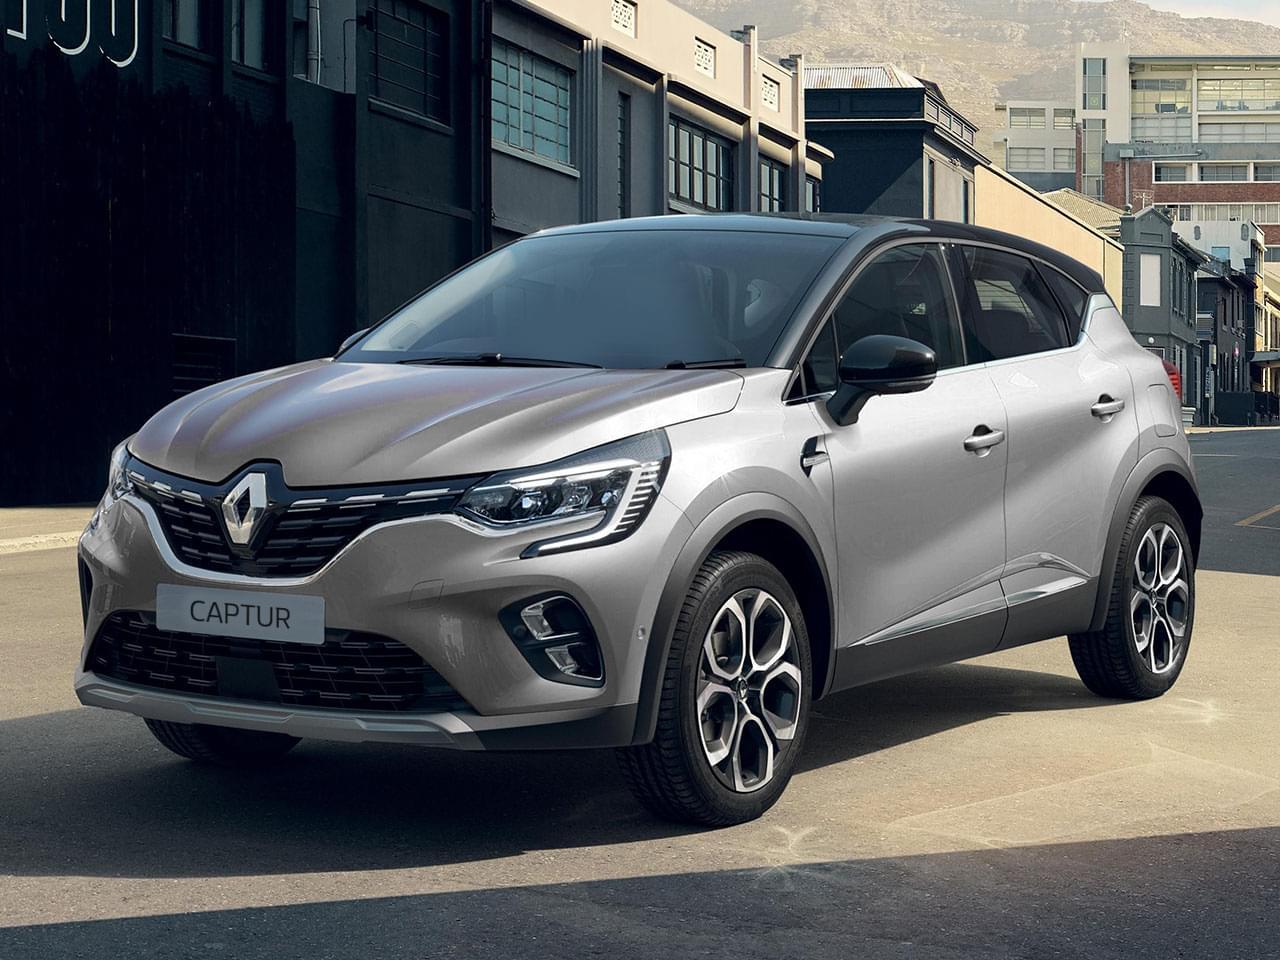 Renault Captur Intens E-Tech Plug-in Hybrid 160